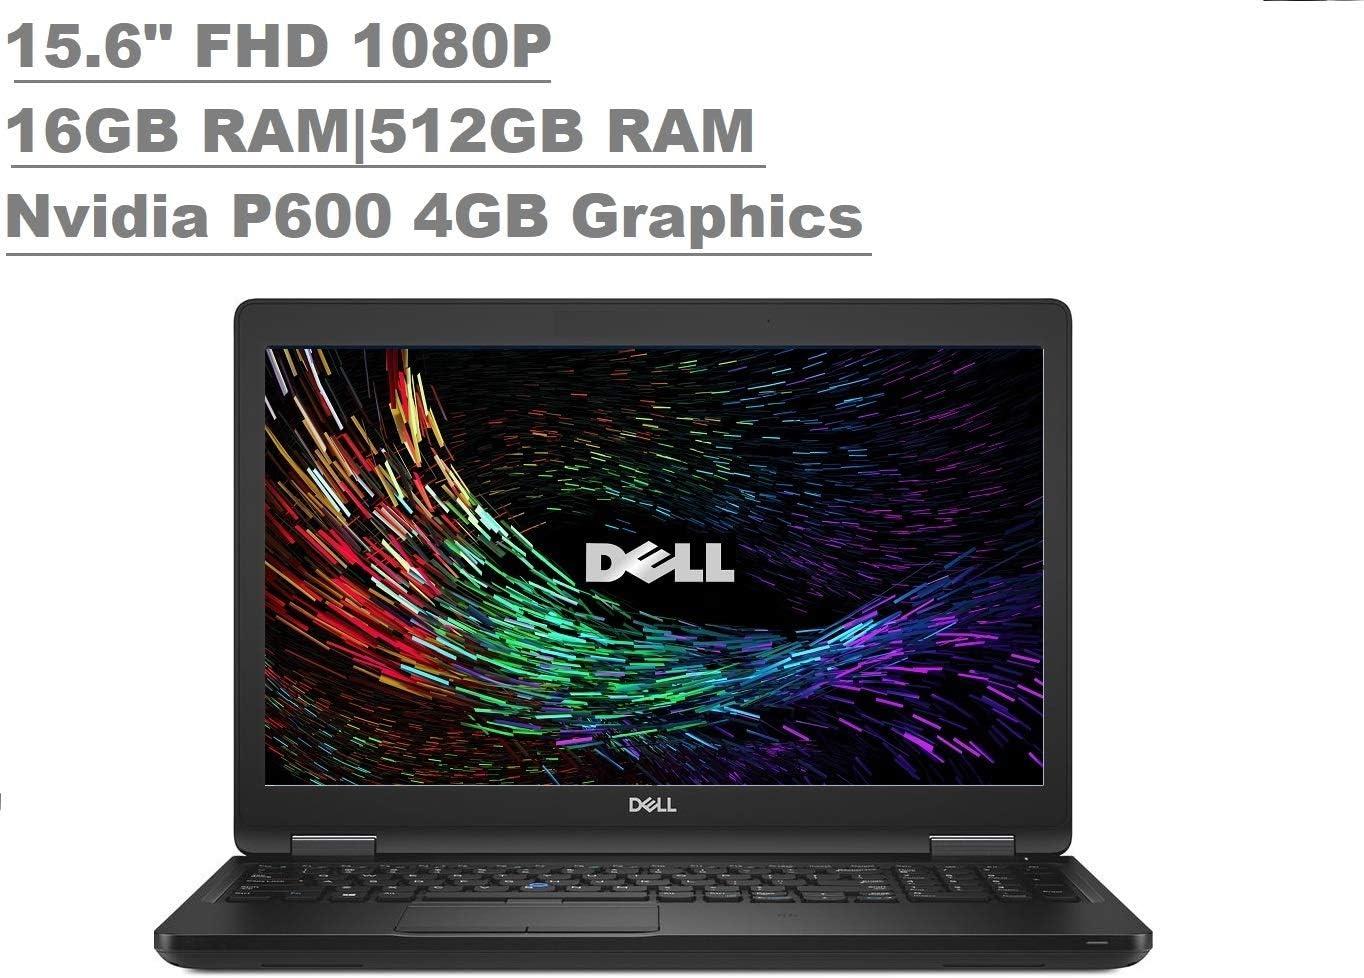 "Dell Precision 3530 M3530 15.6"" FHD (1920x1080) Mobile Worksation Laptop (Intel Quad-Core i5-8400H, 16GB DDR4, 512GB SSD, Quadro P600 4GB Graphics) Backlit, Thunderbolt 3, (NO Webcam) Windows 10 Pro"